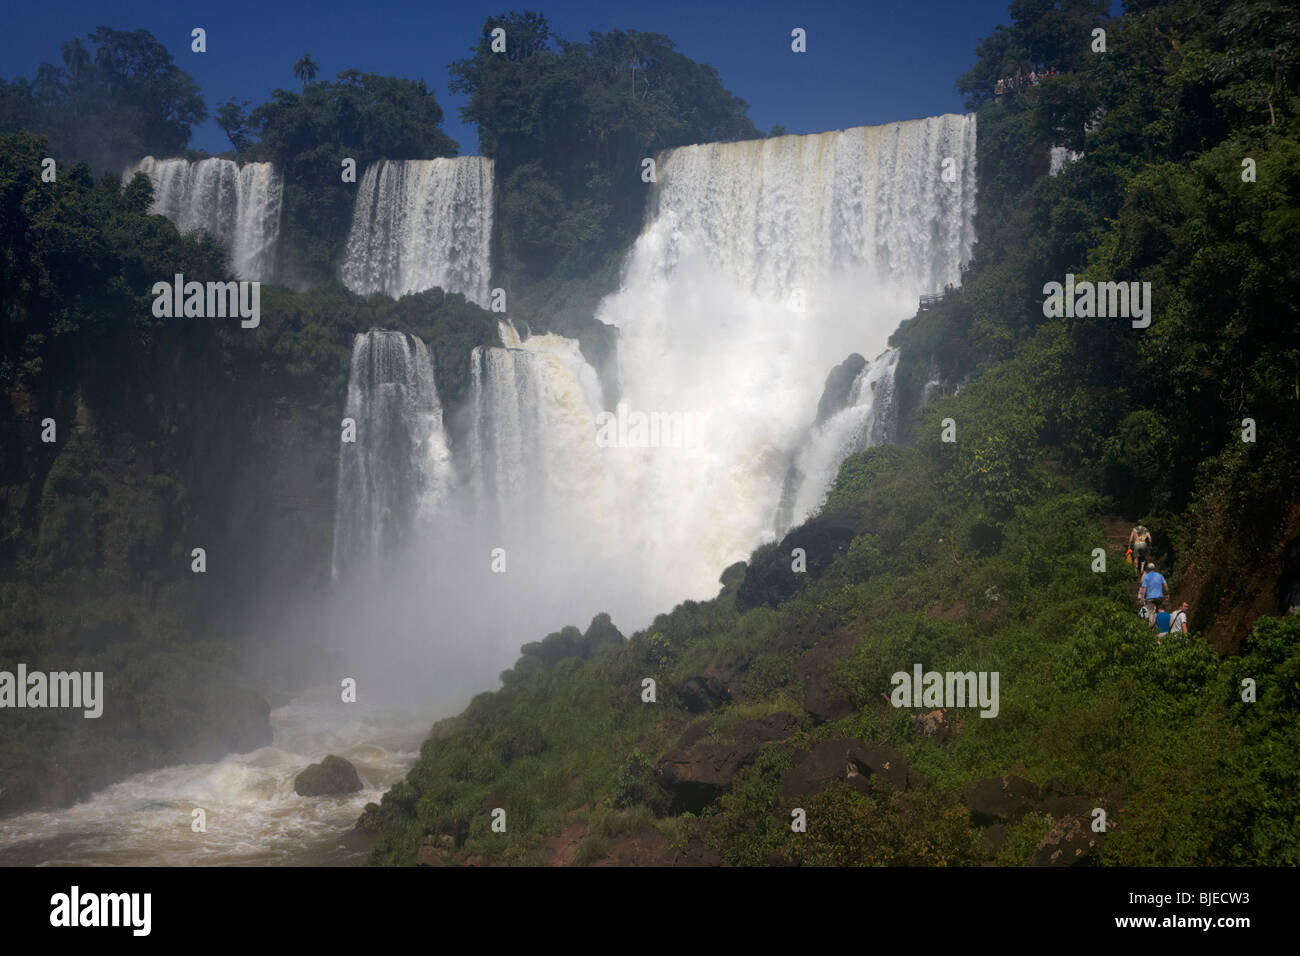 tourists on lower circuit underneath the adan y eva adam and eve fall iguazu national park, republic of argentina, - Stock Image